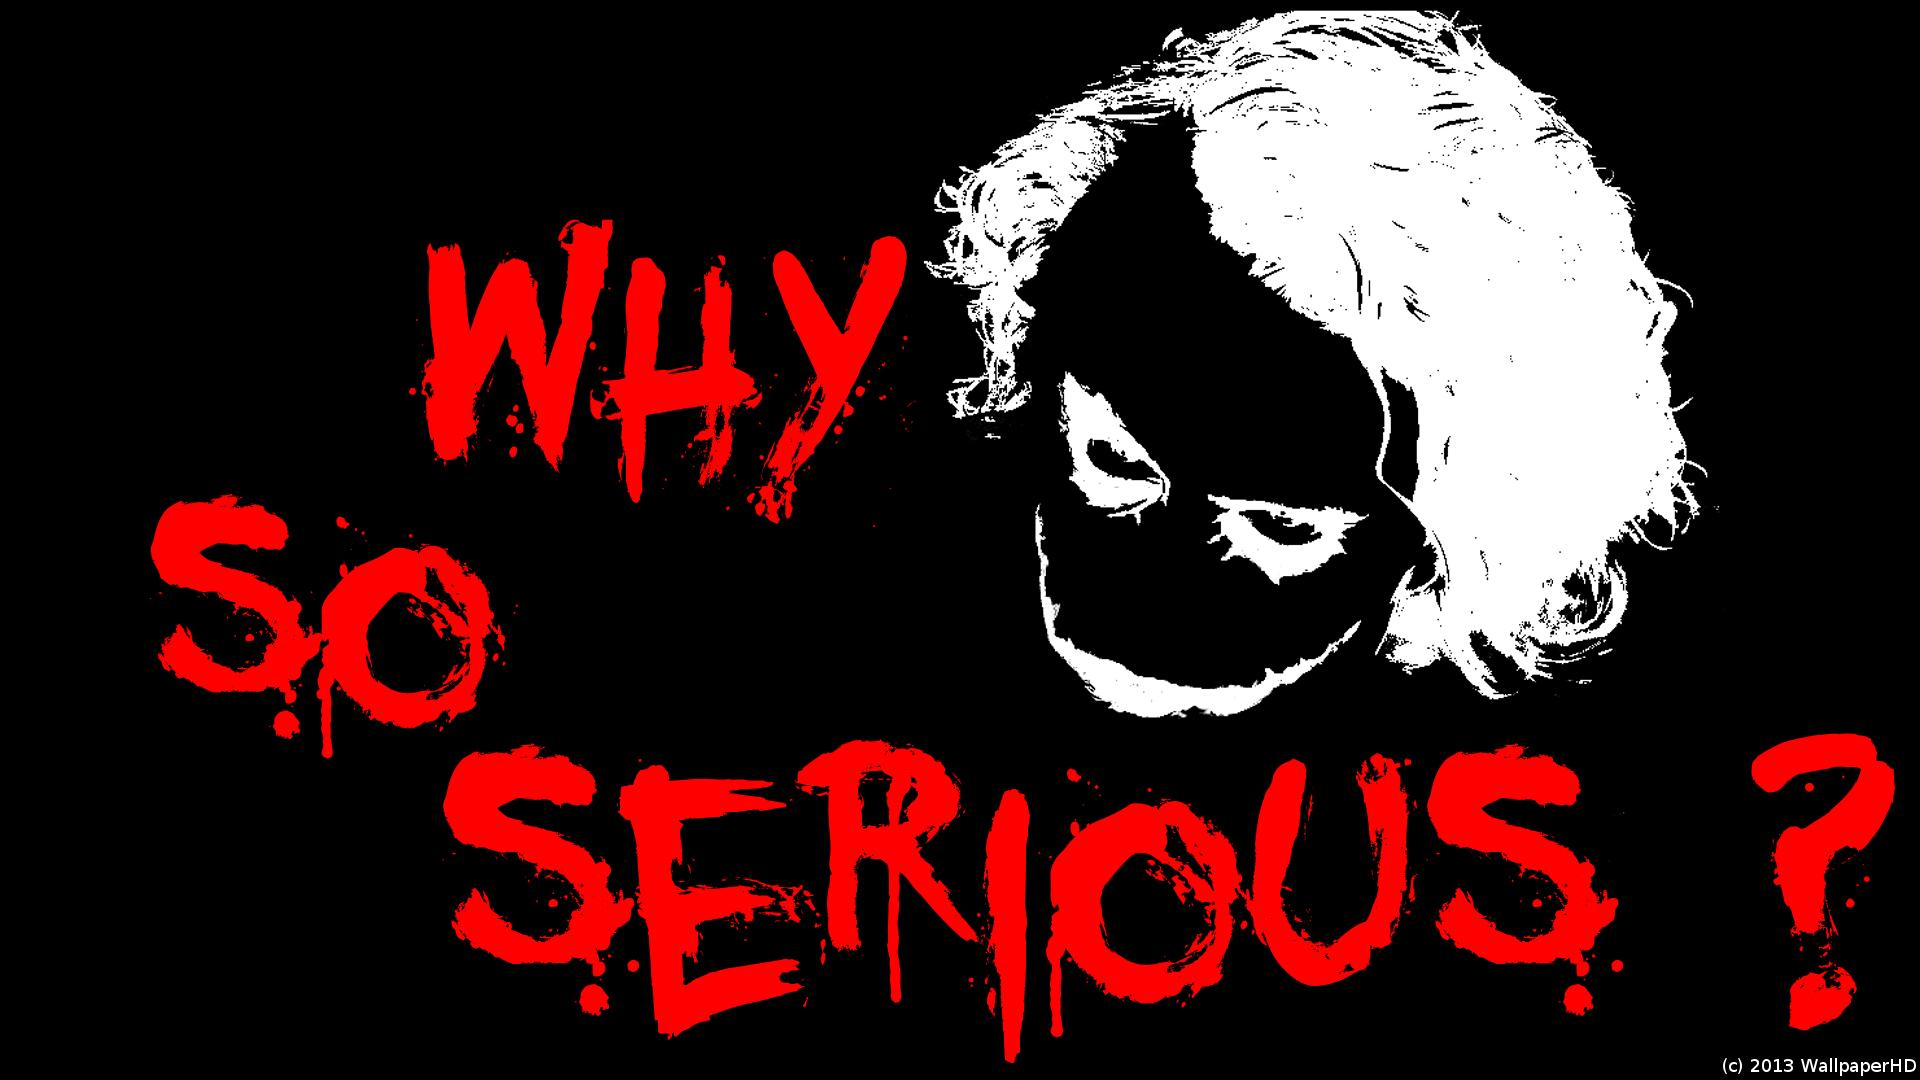 Why So Serious Joker Wallpaper By WallpaperHD